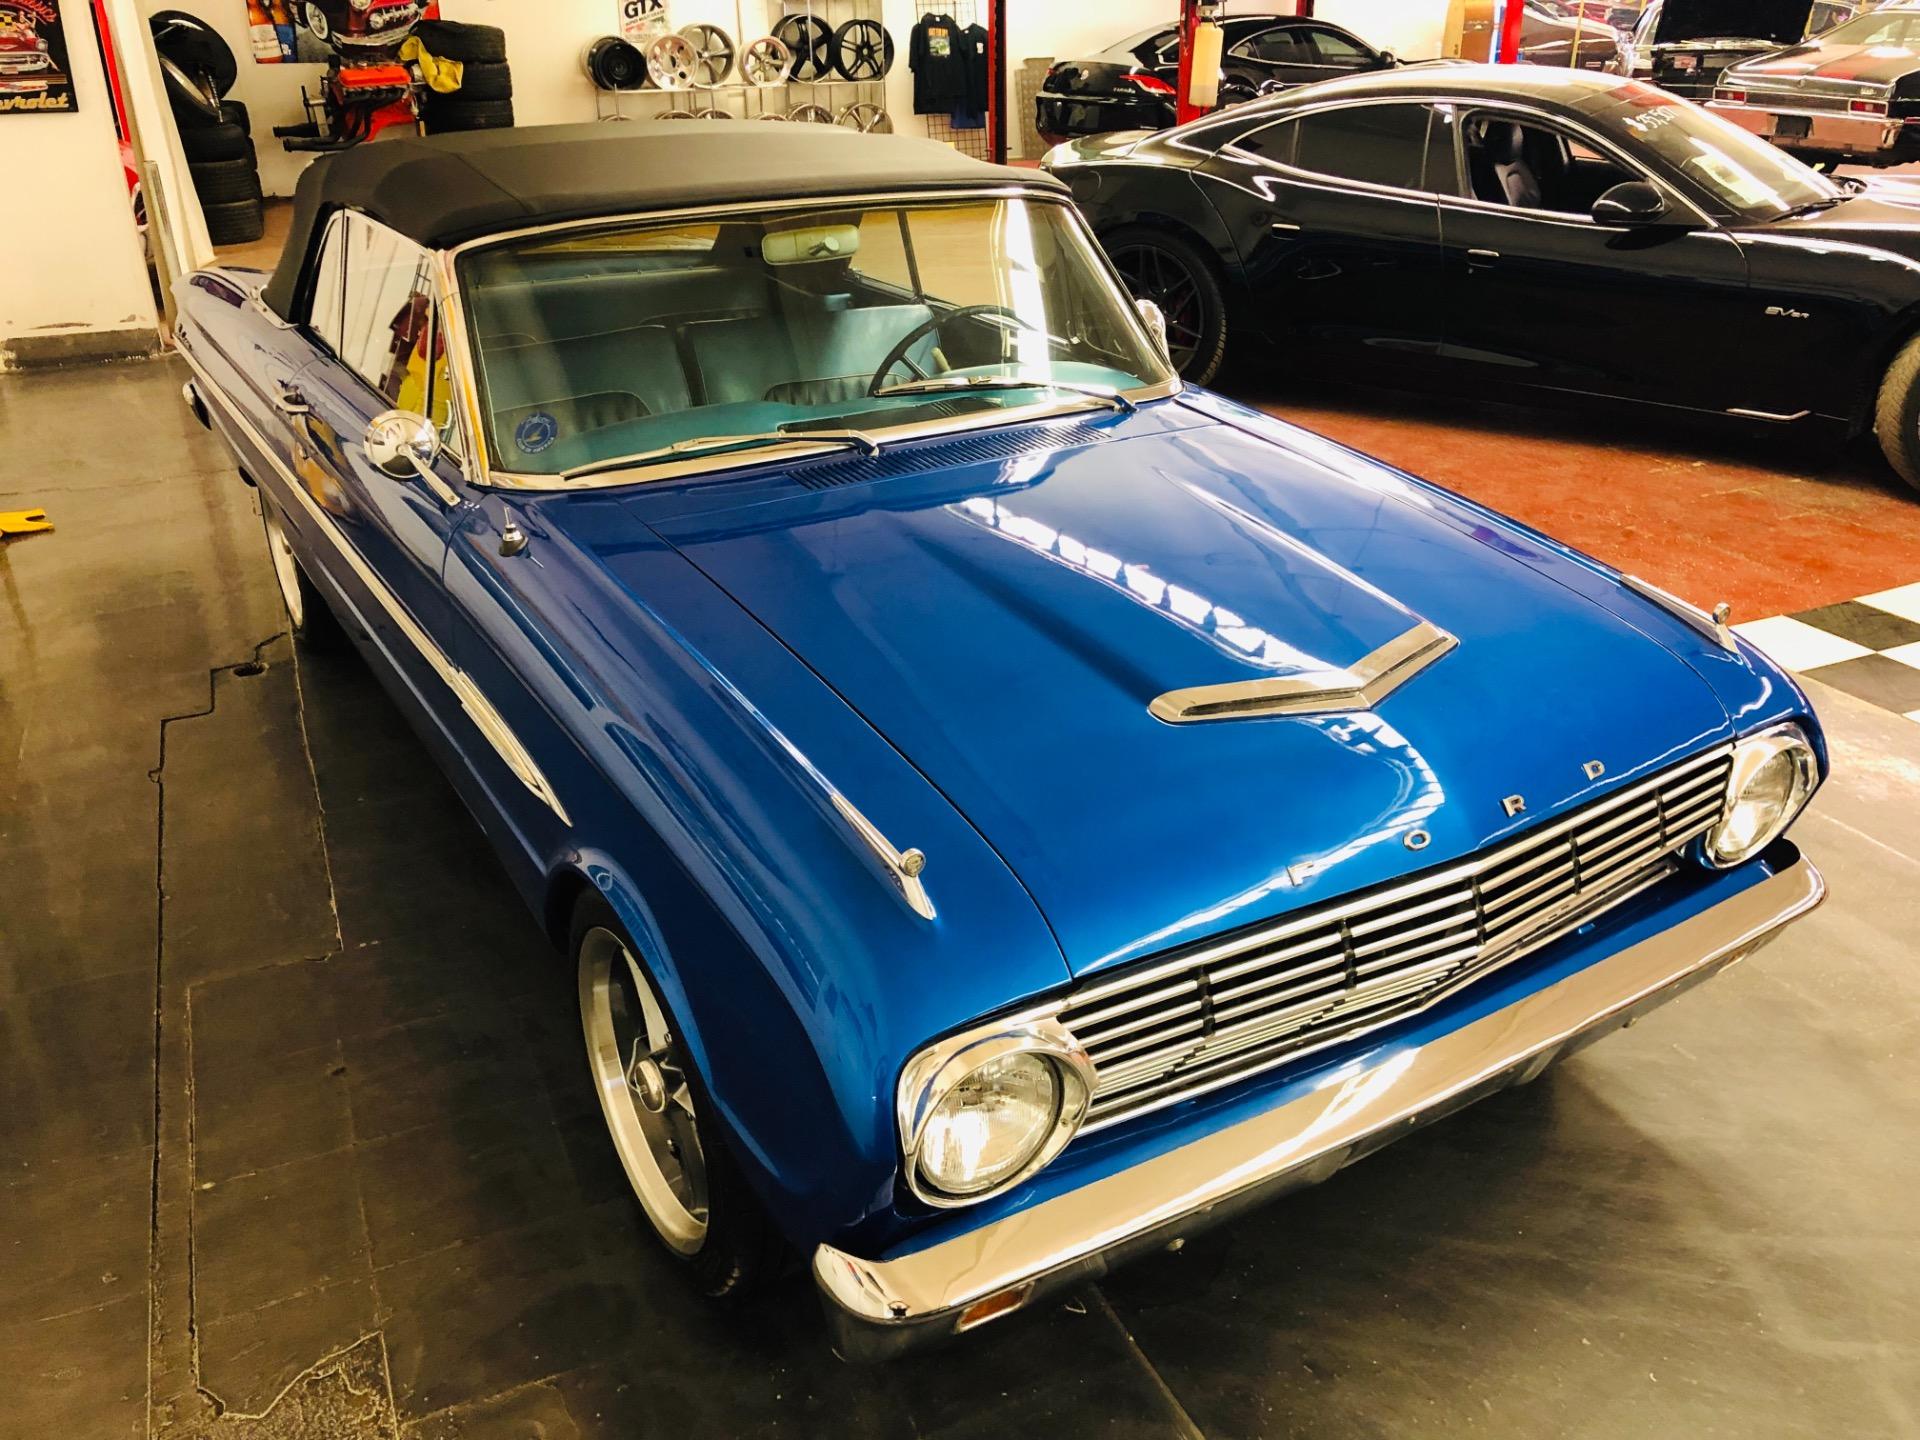 1963 Ford Falcon -FUTURA-BLUE ANGEL-4 WHEEL DISC